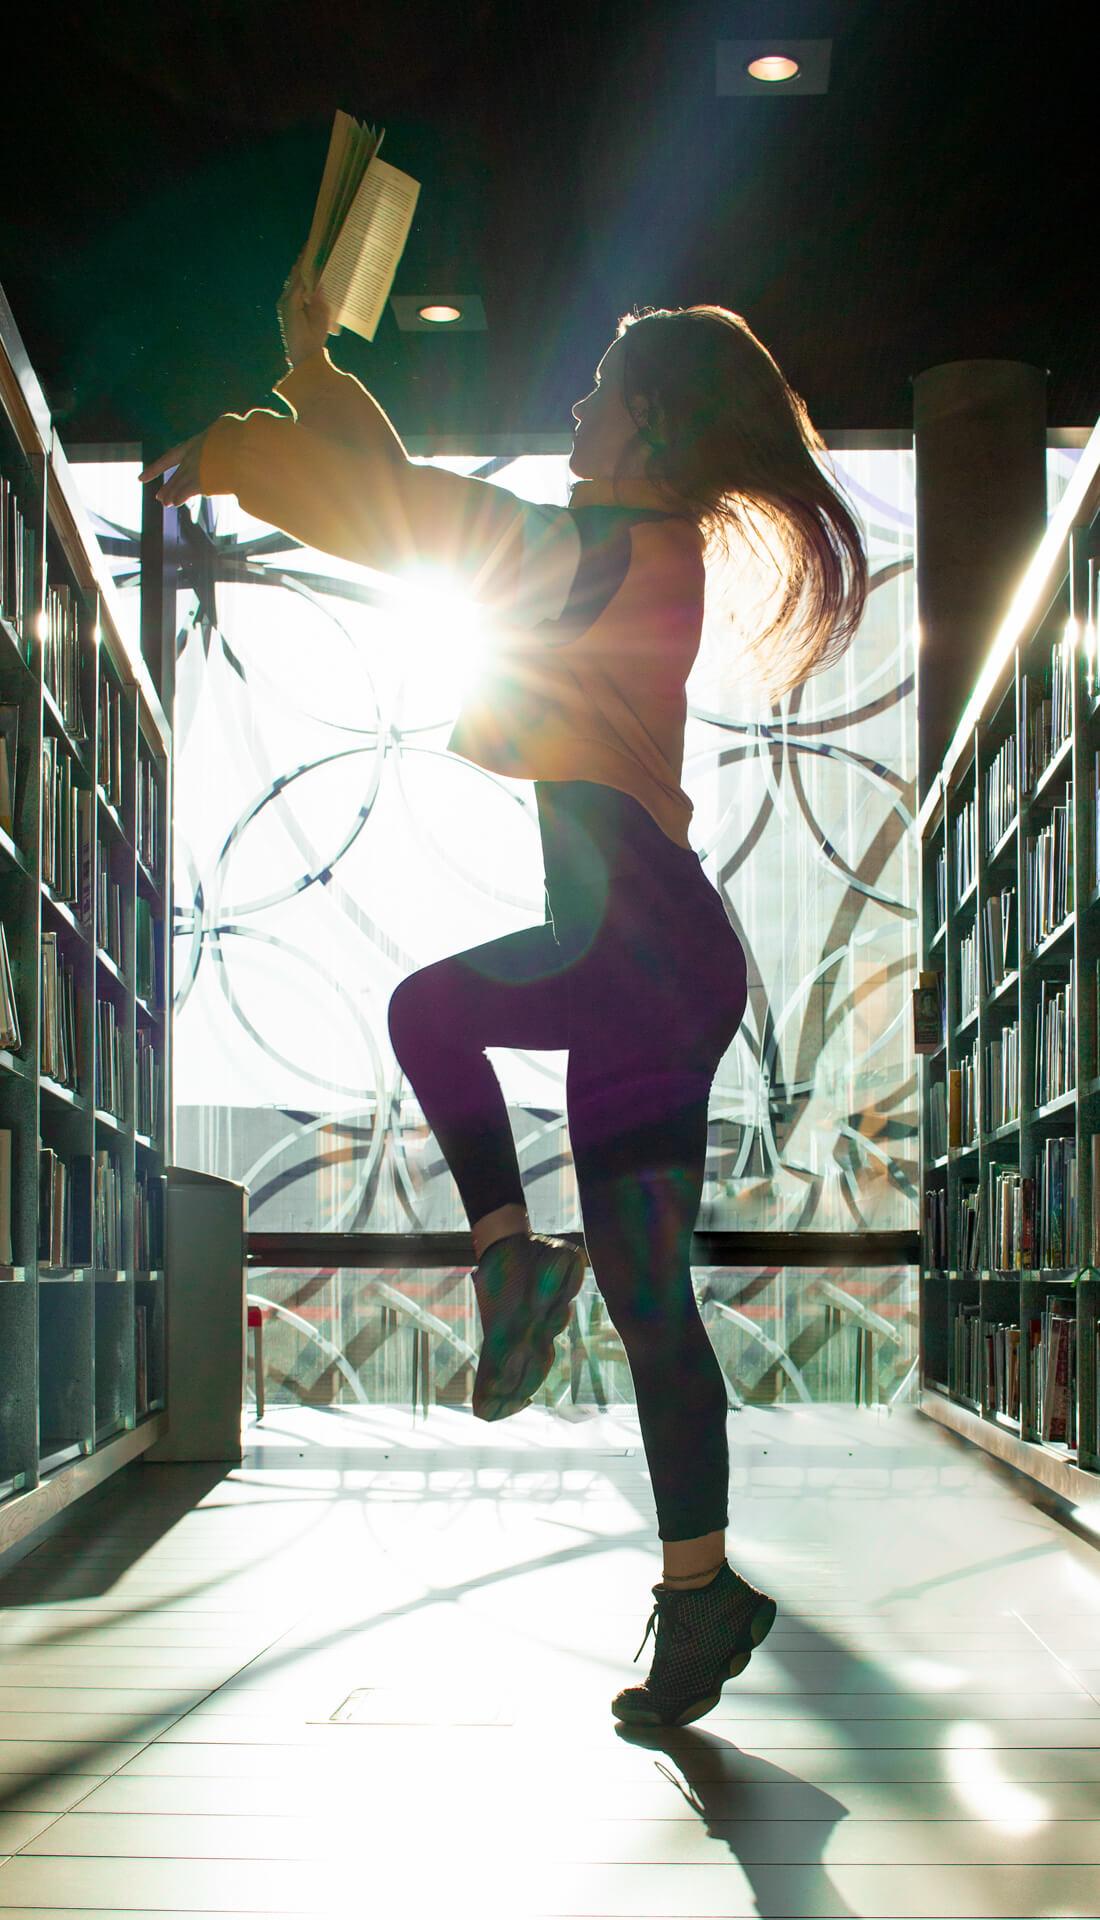 Creative dance portfolio photoshoot Birmingham uk, dance photographer uk, ballet dance photoshoot in Birmingham Library